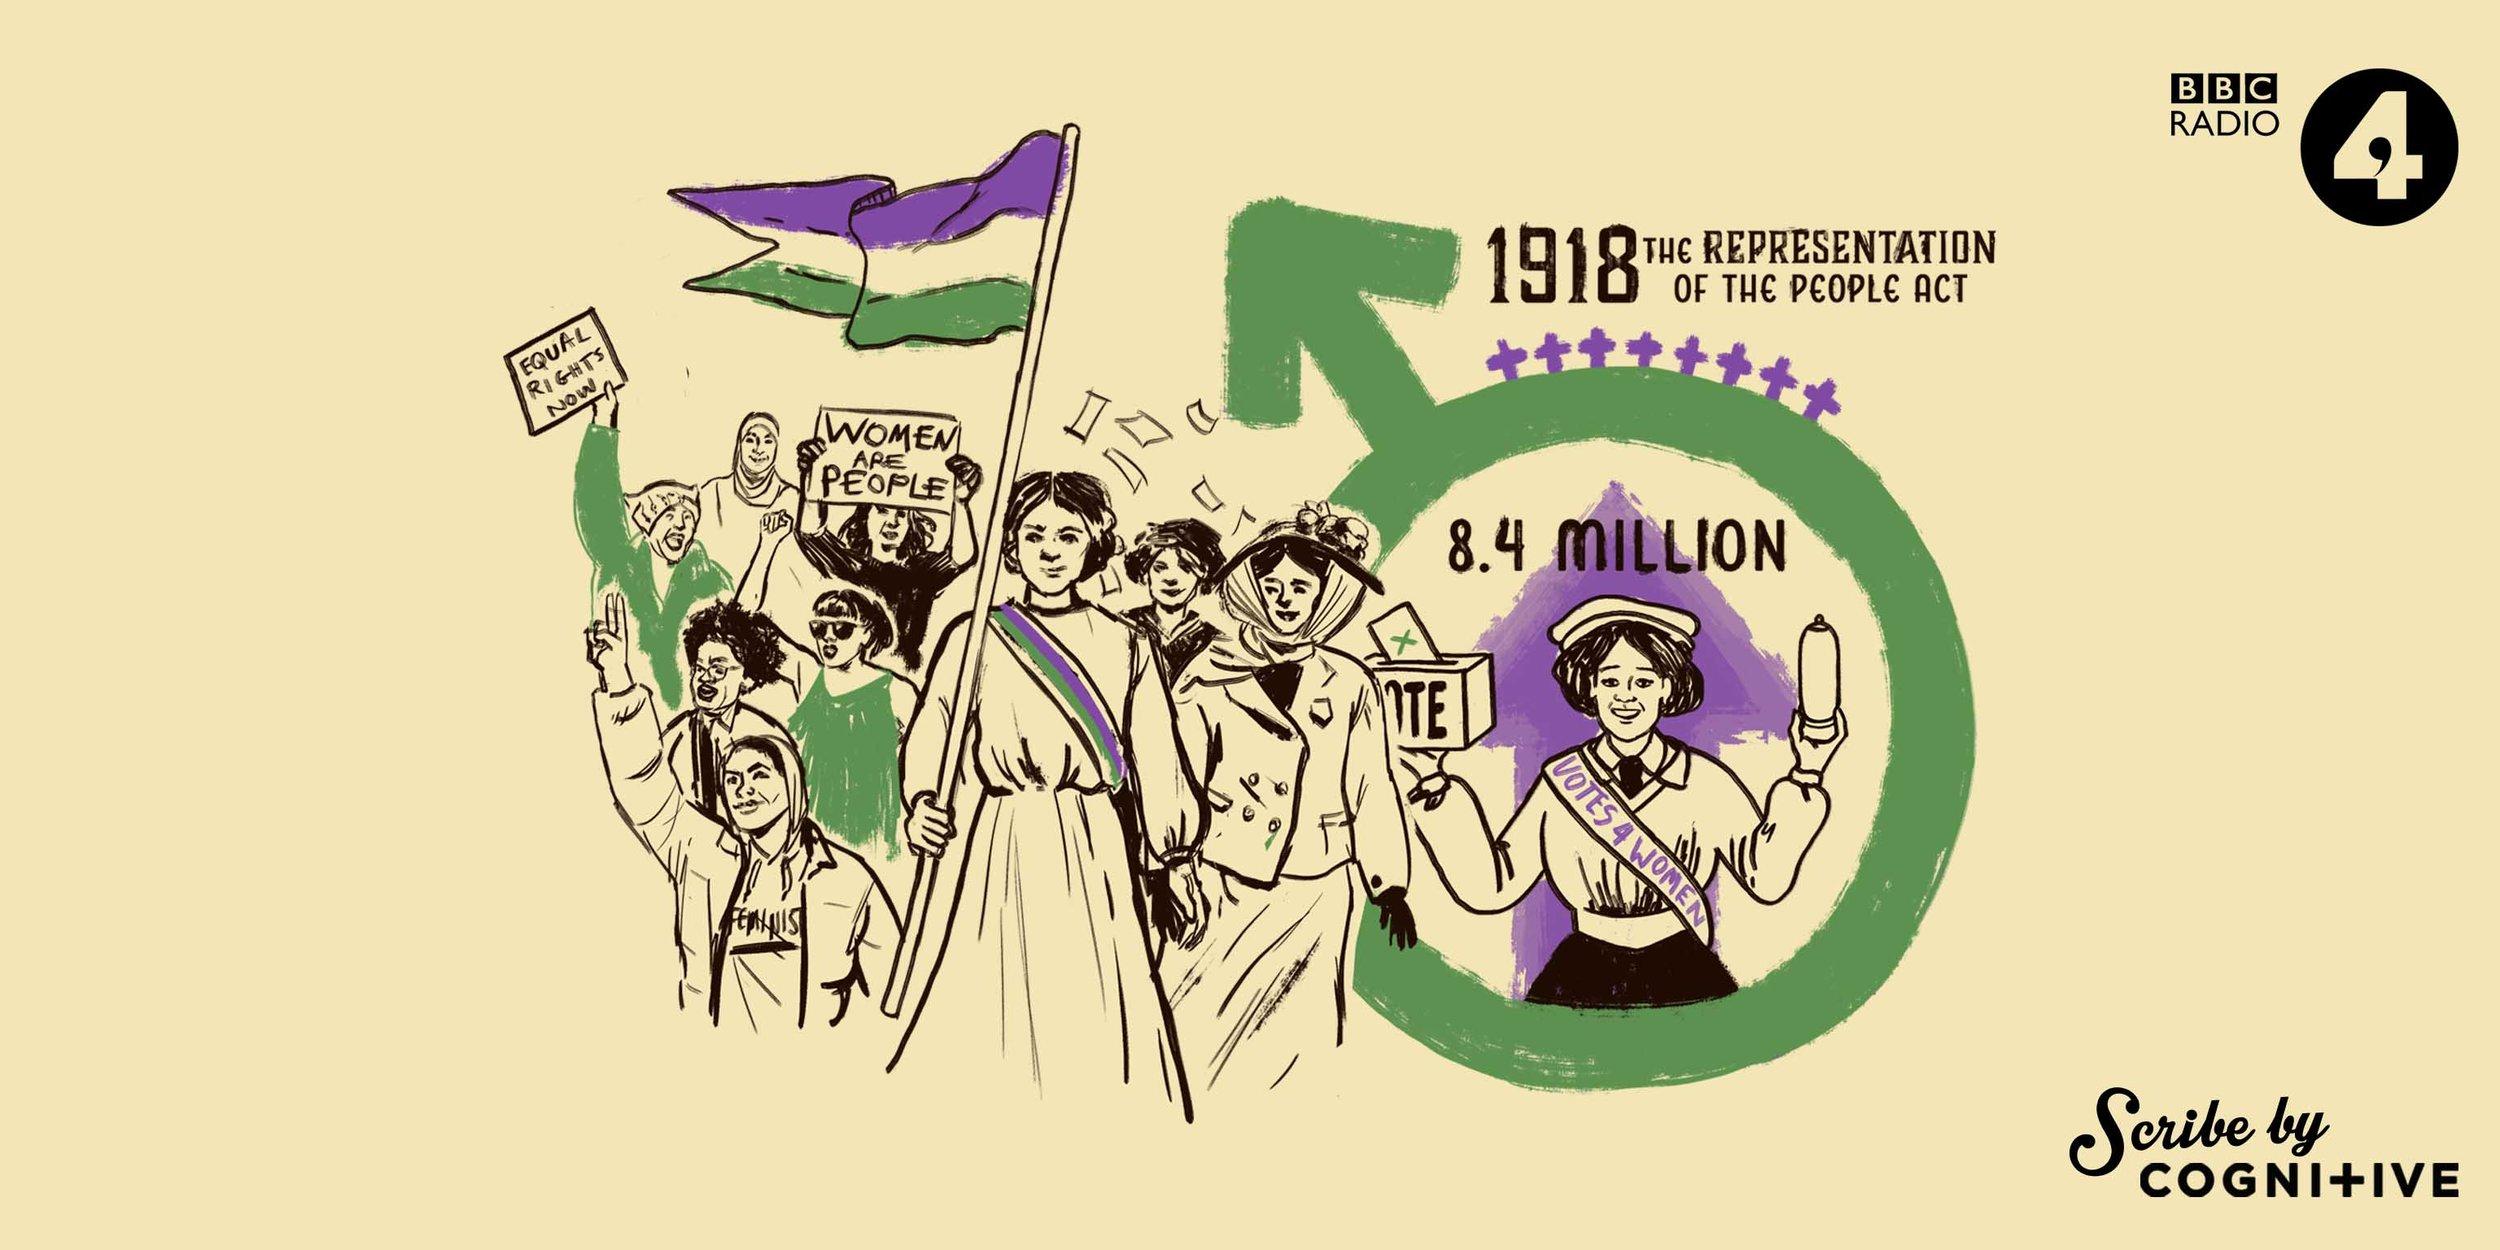 Cognitive_Suffragettes_Animation 06